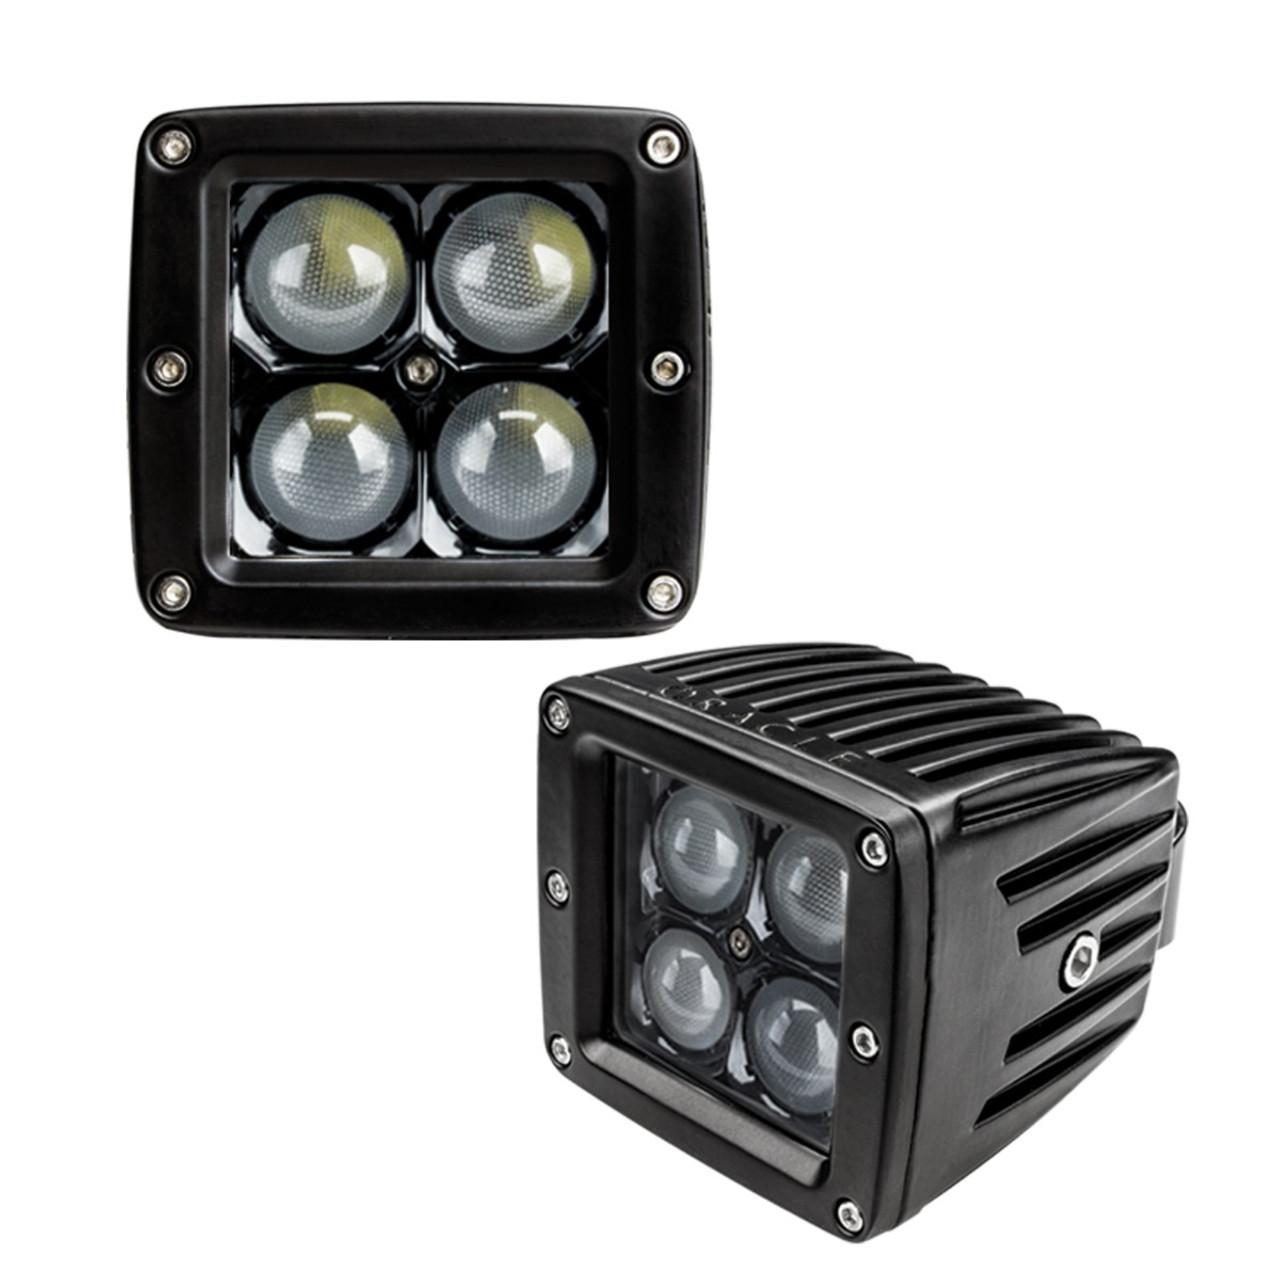 BLACK SERIES - 7D 3in 20W LED SQUARE SPOT/FLOOD LIGHT